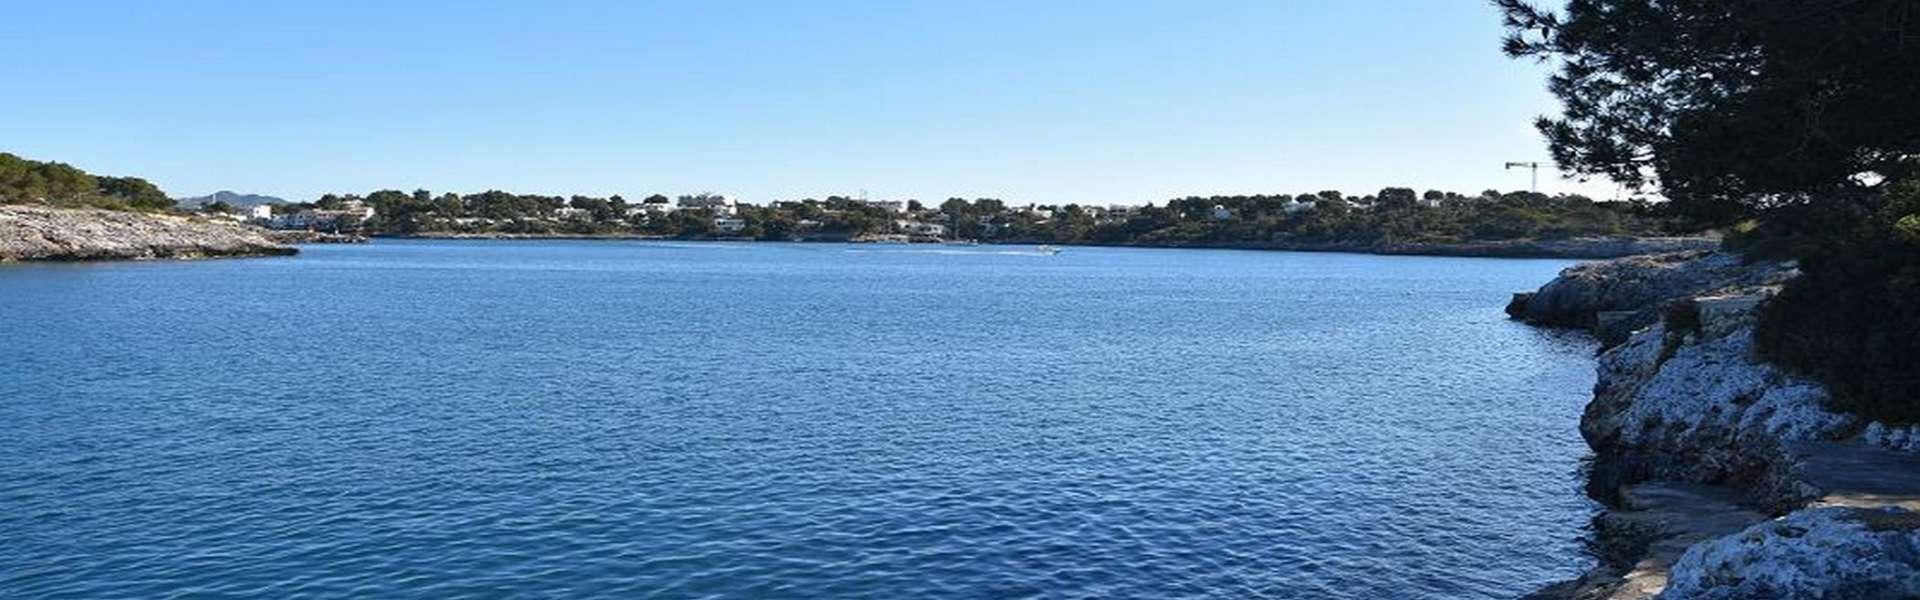 Porto Petro - Reihenmittelhaus in erster Meeresline